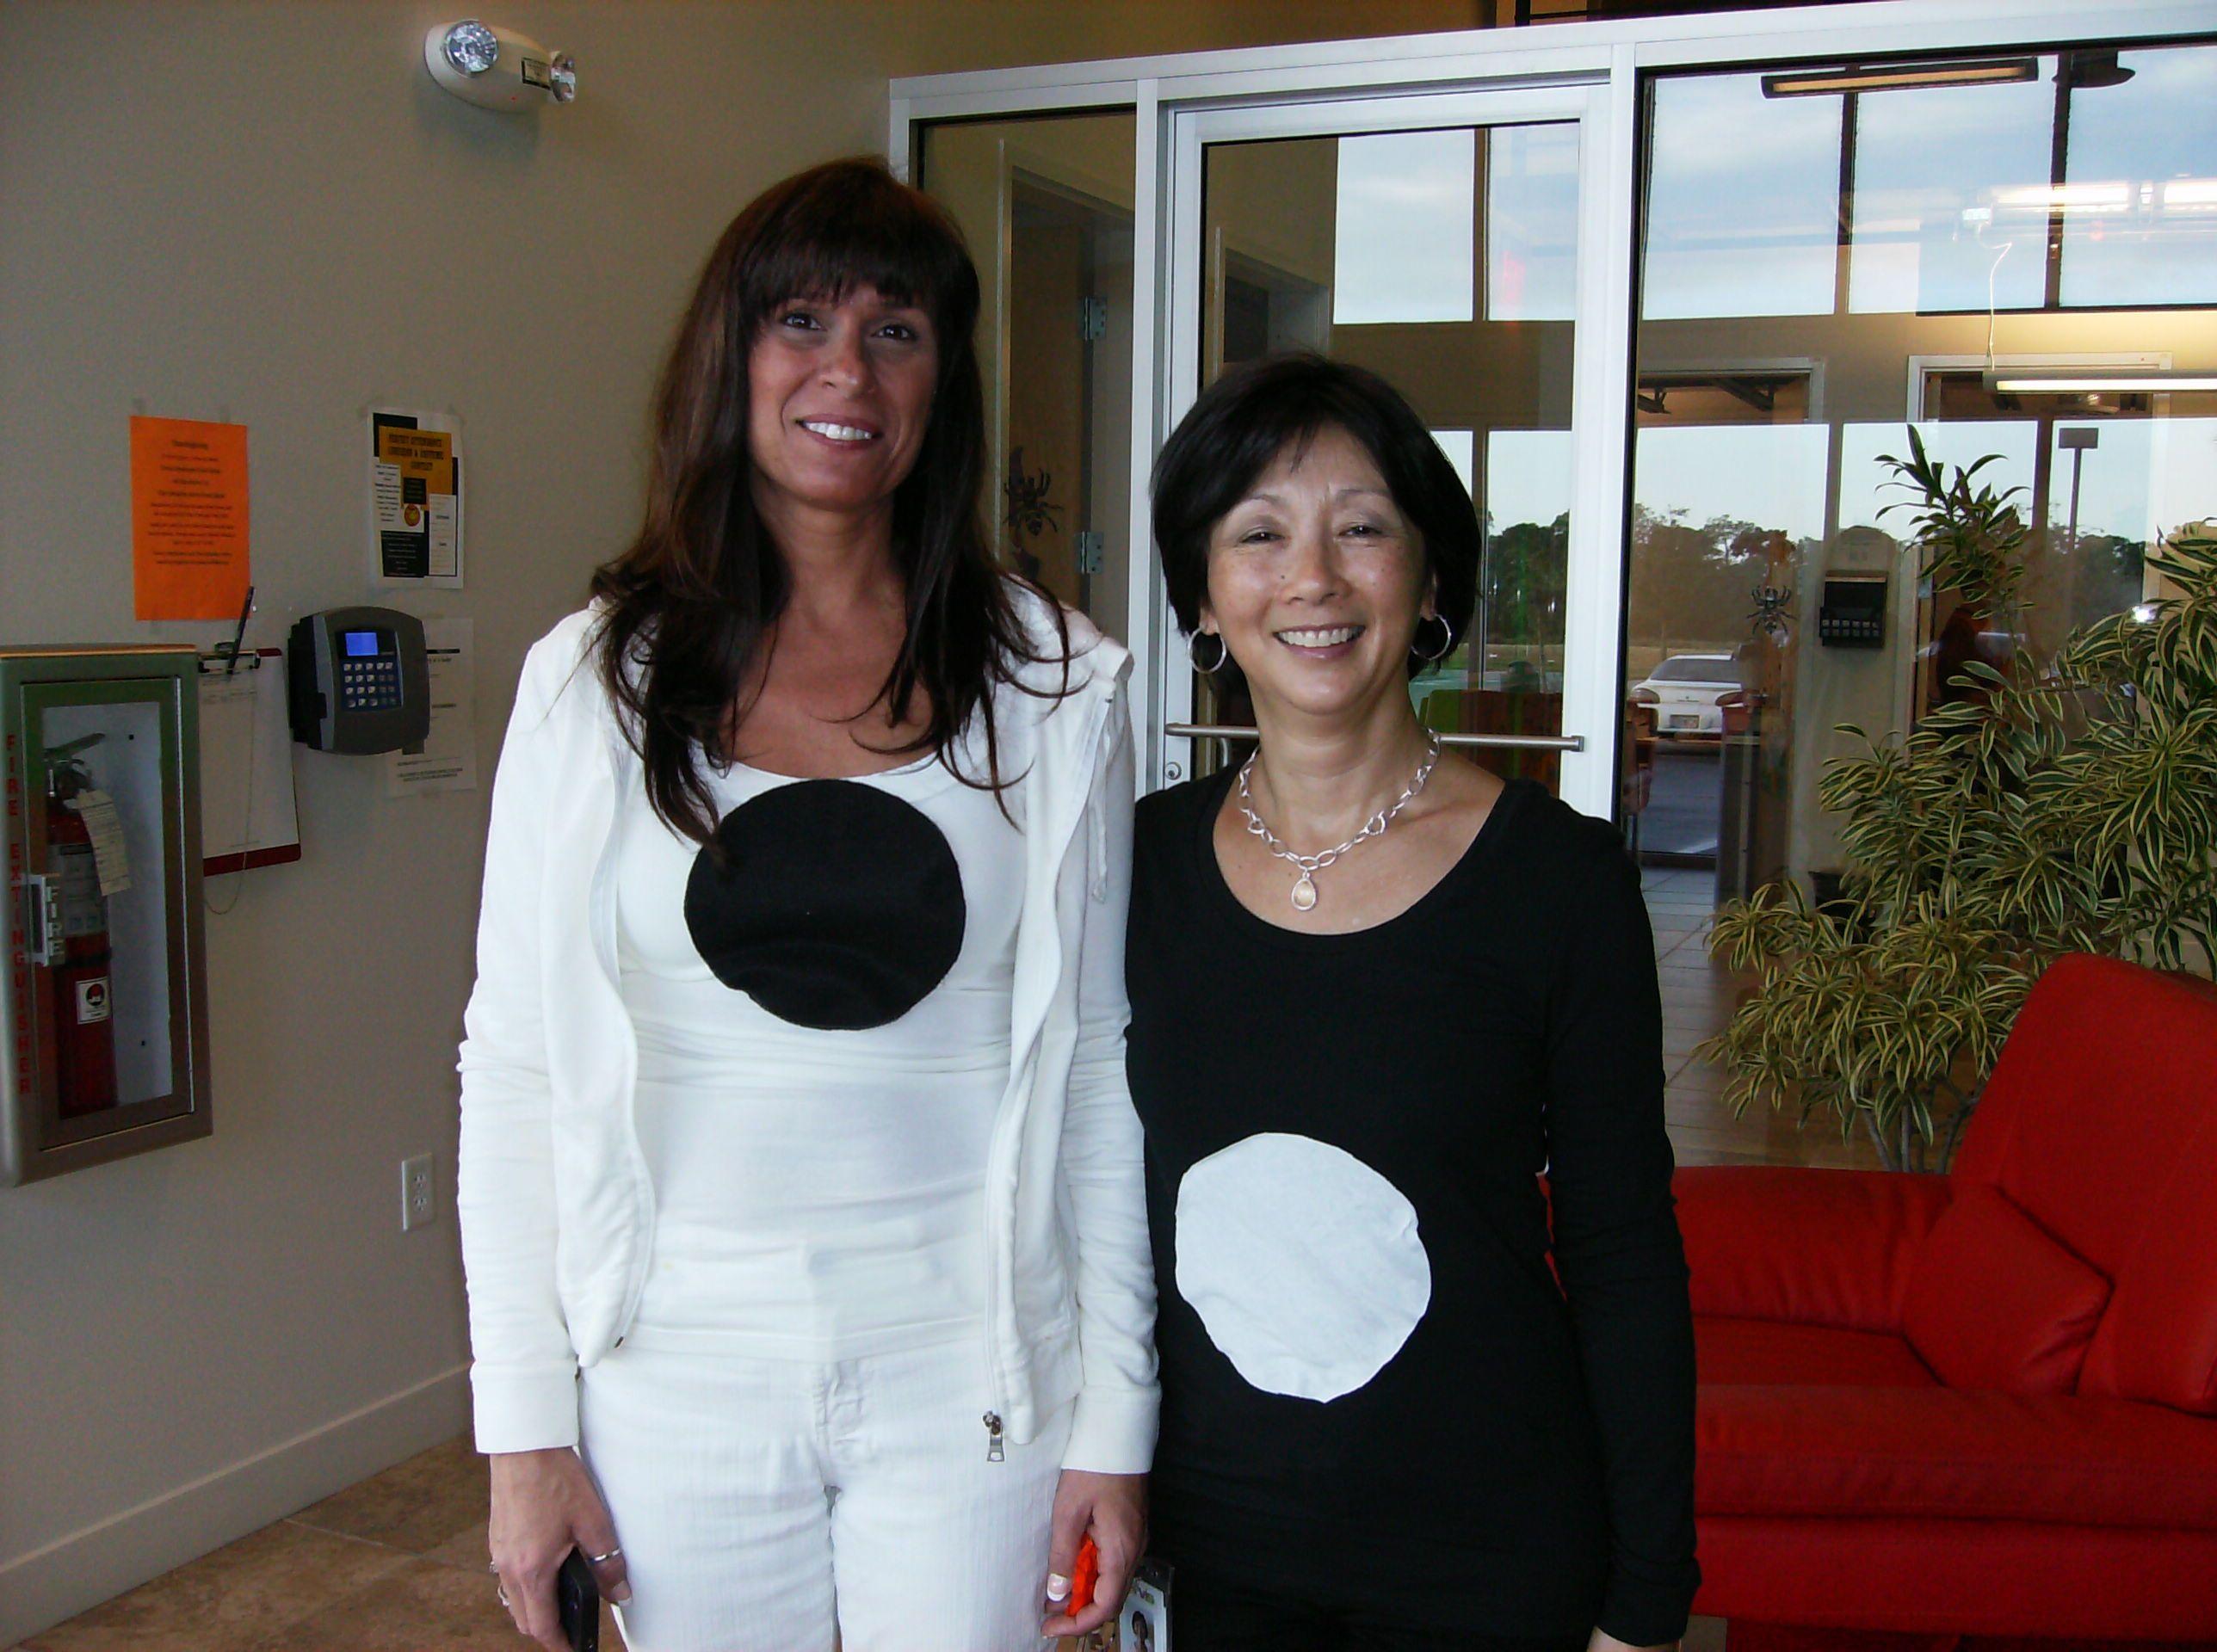 Haloween 20 at Tervis! Yin & Yang!  Bff halloween costumes